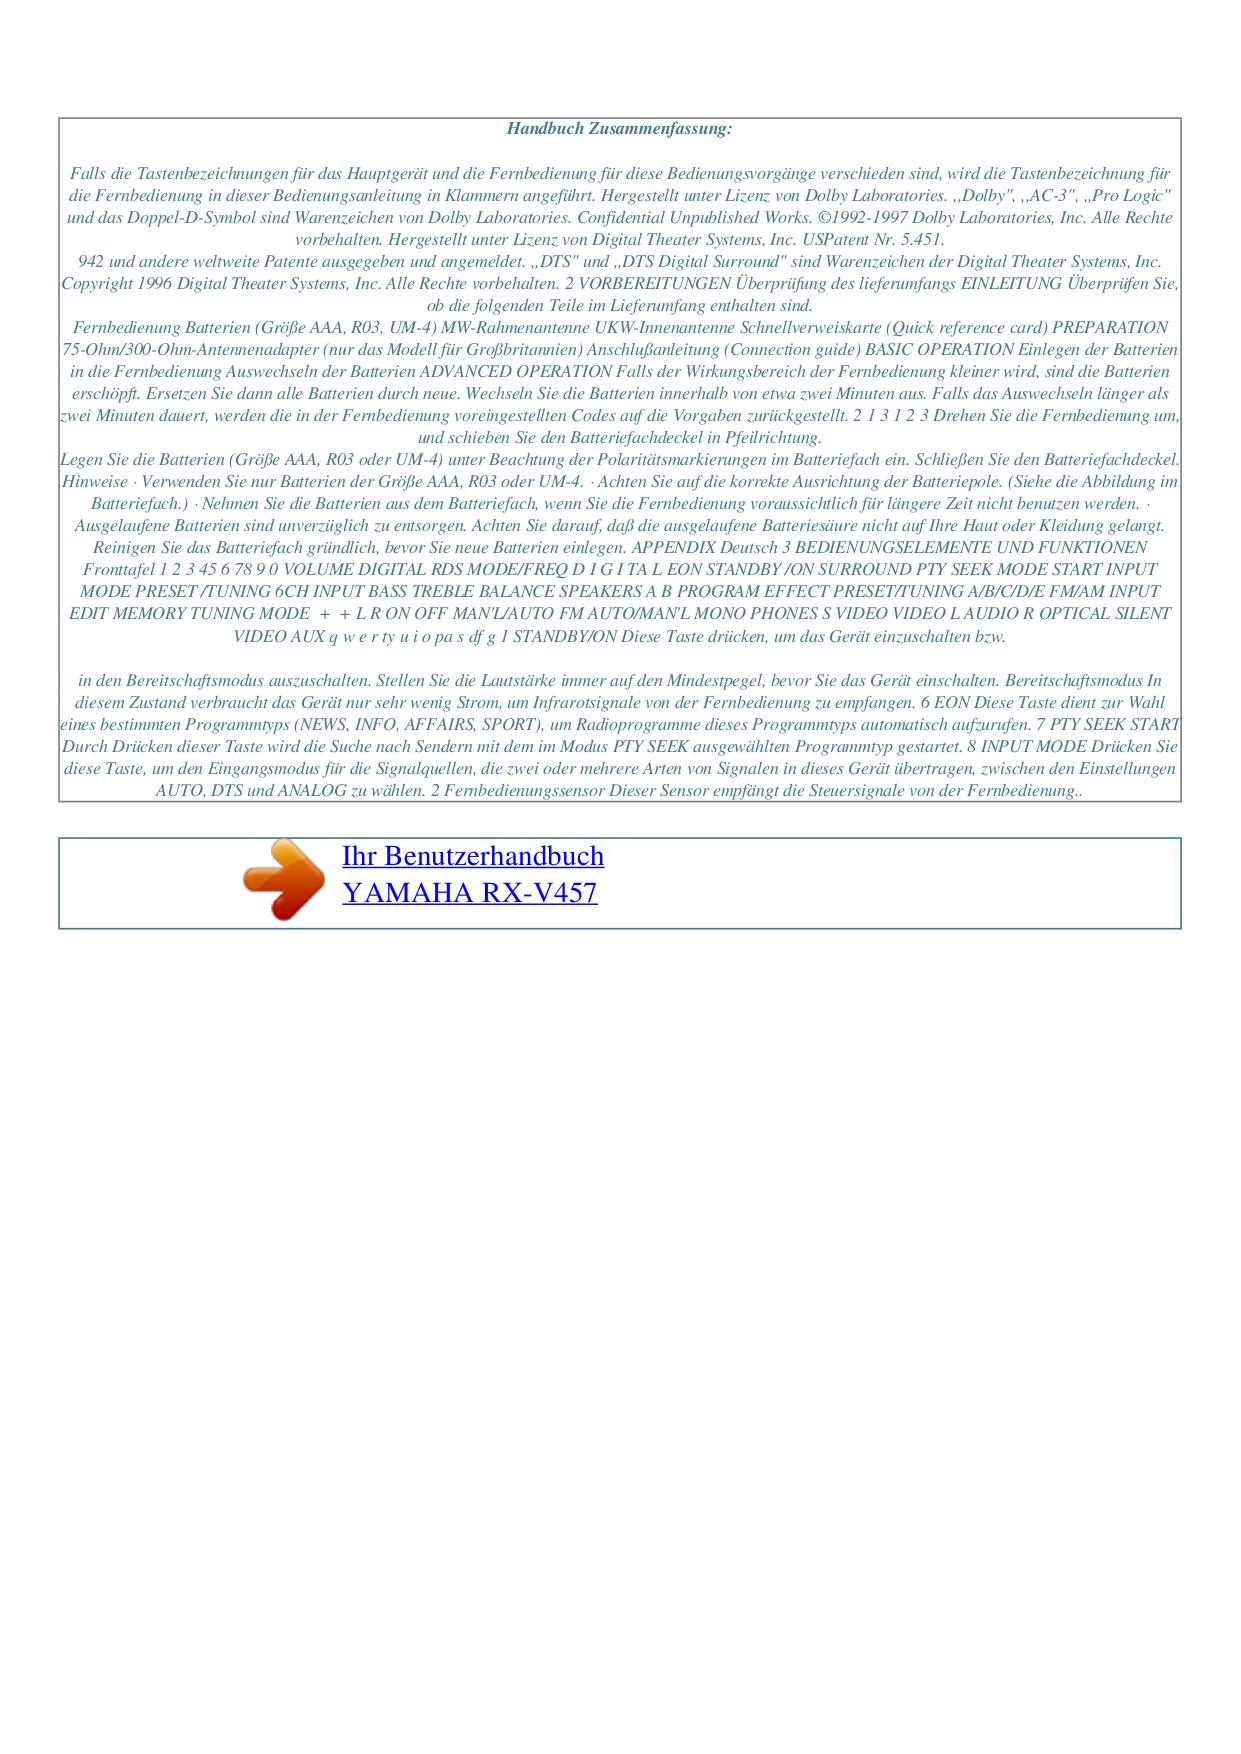 Asignacion de citas bellavista por internet hombre para mujer Córdoba-60191